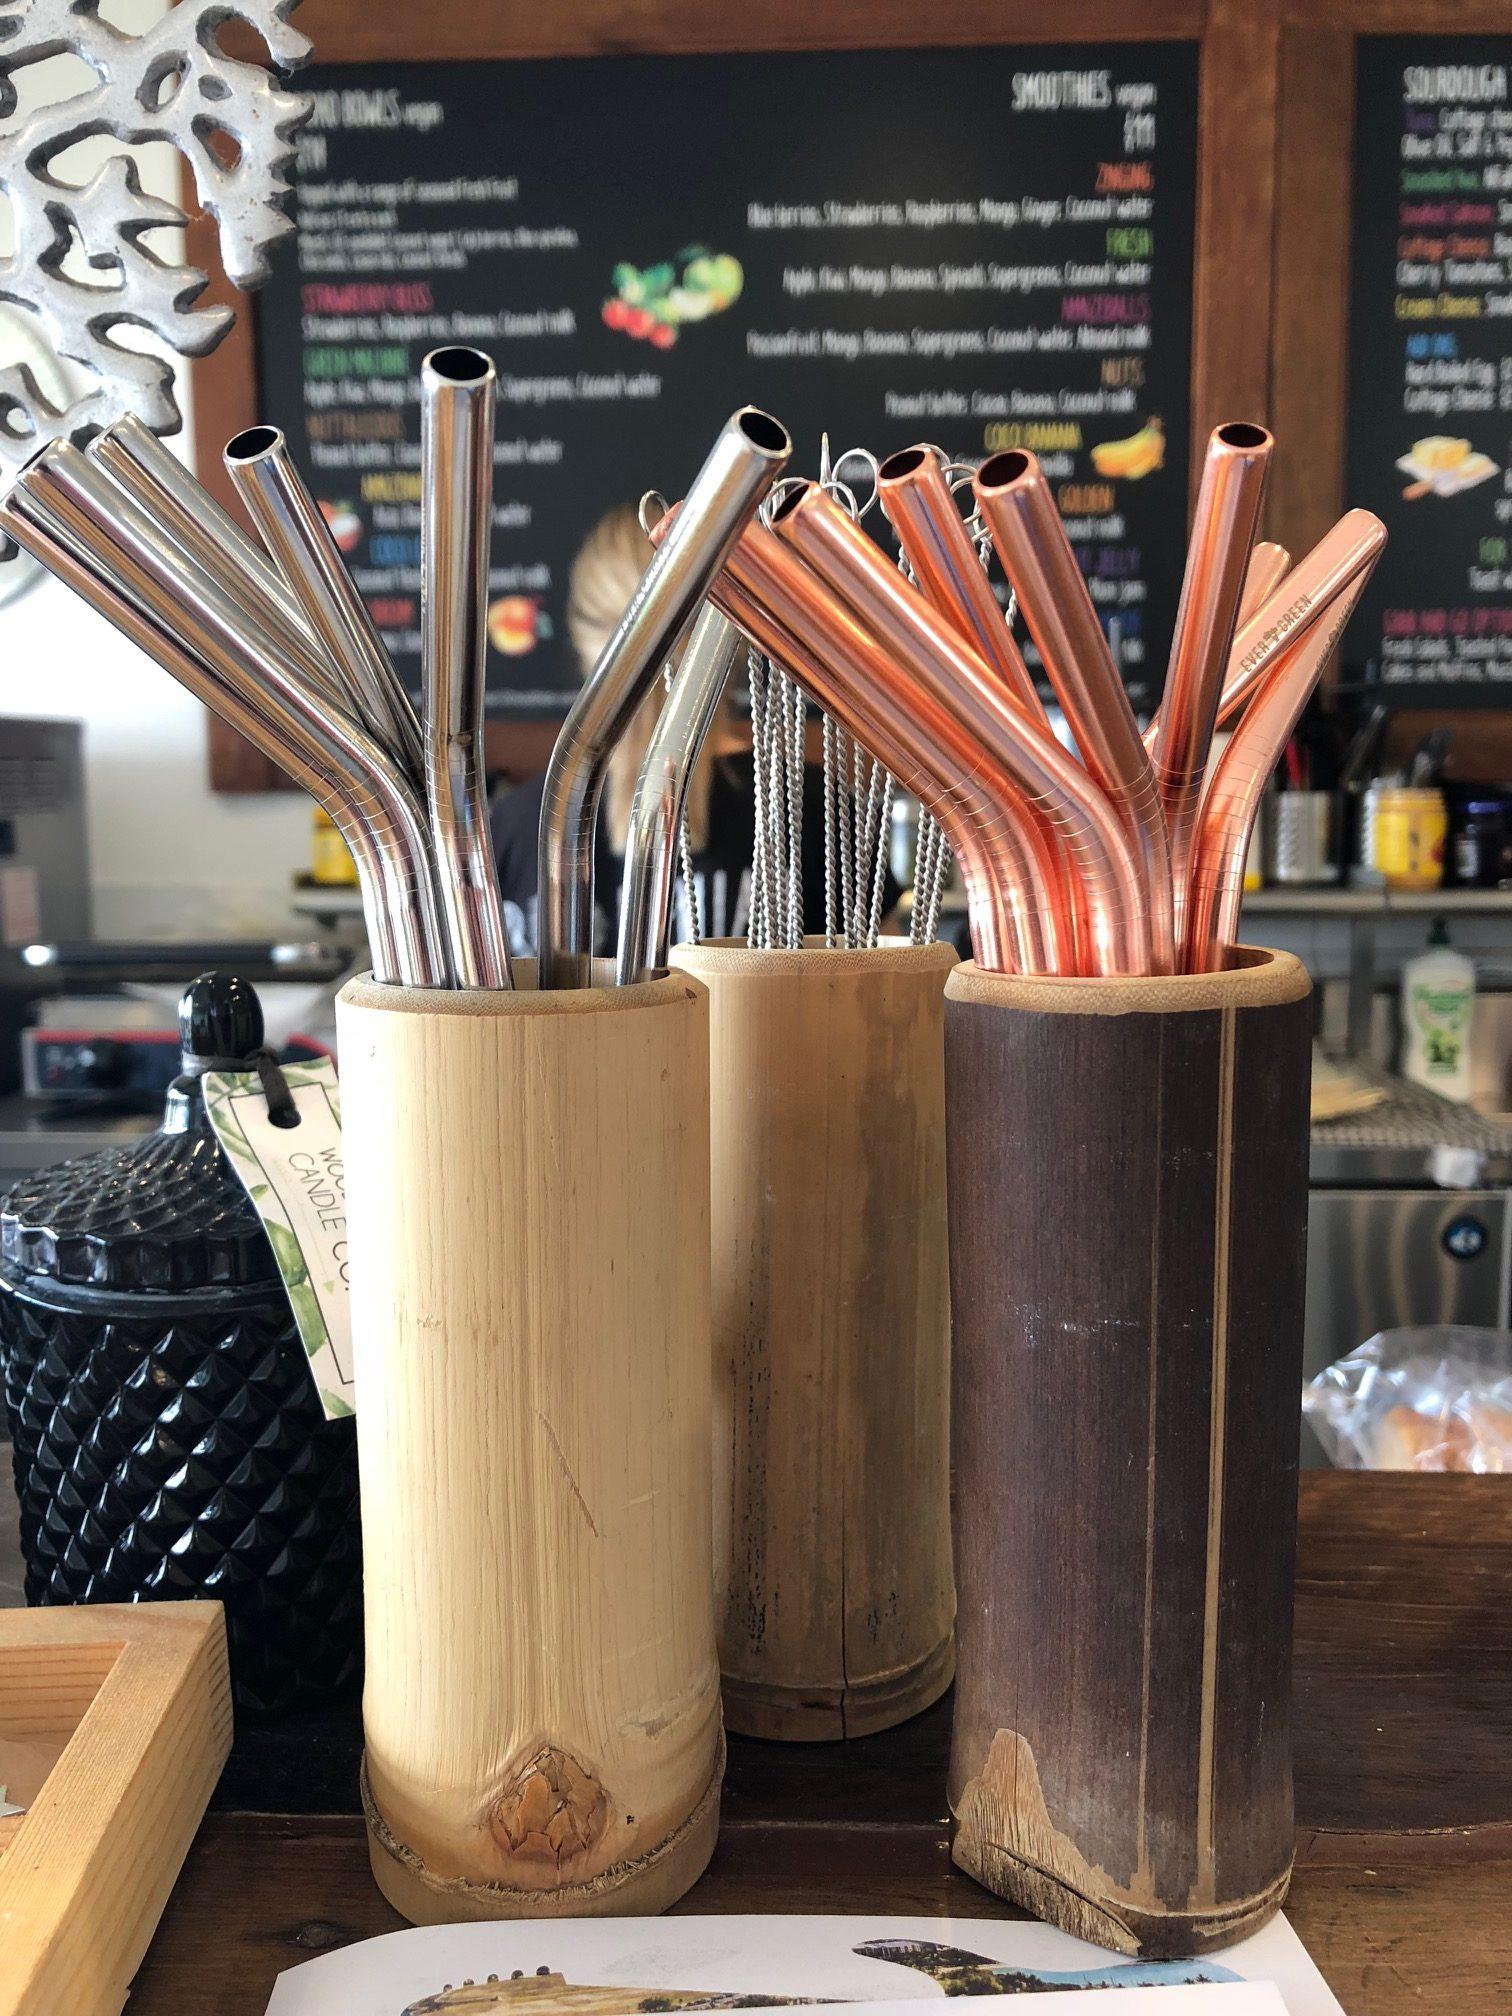 Bohemian Raw Cafe stainless steel straws.